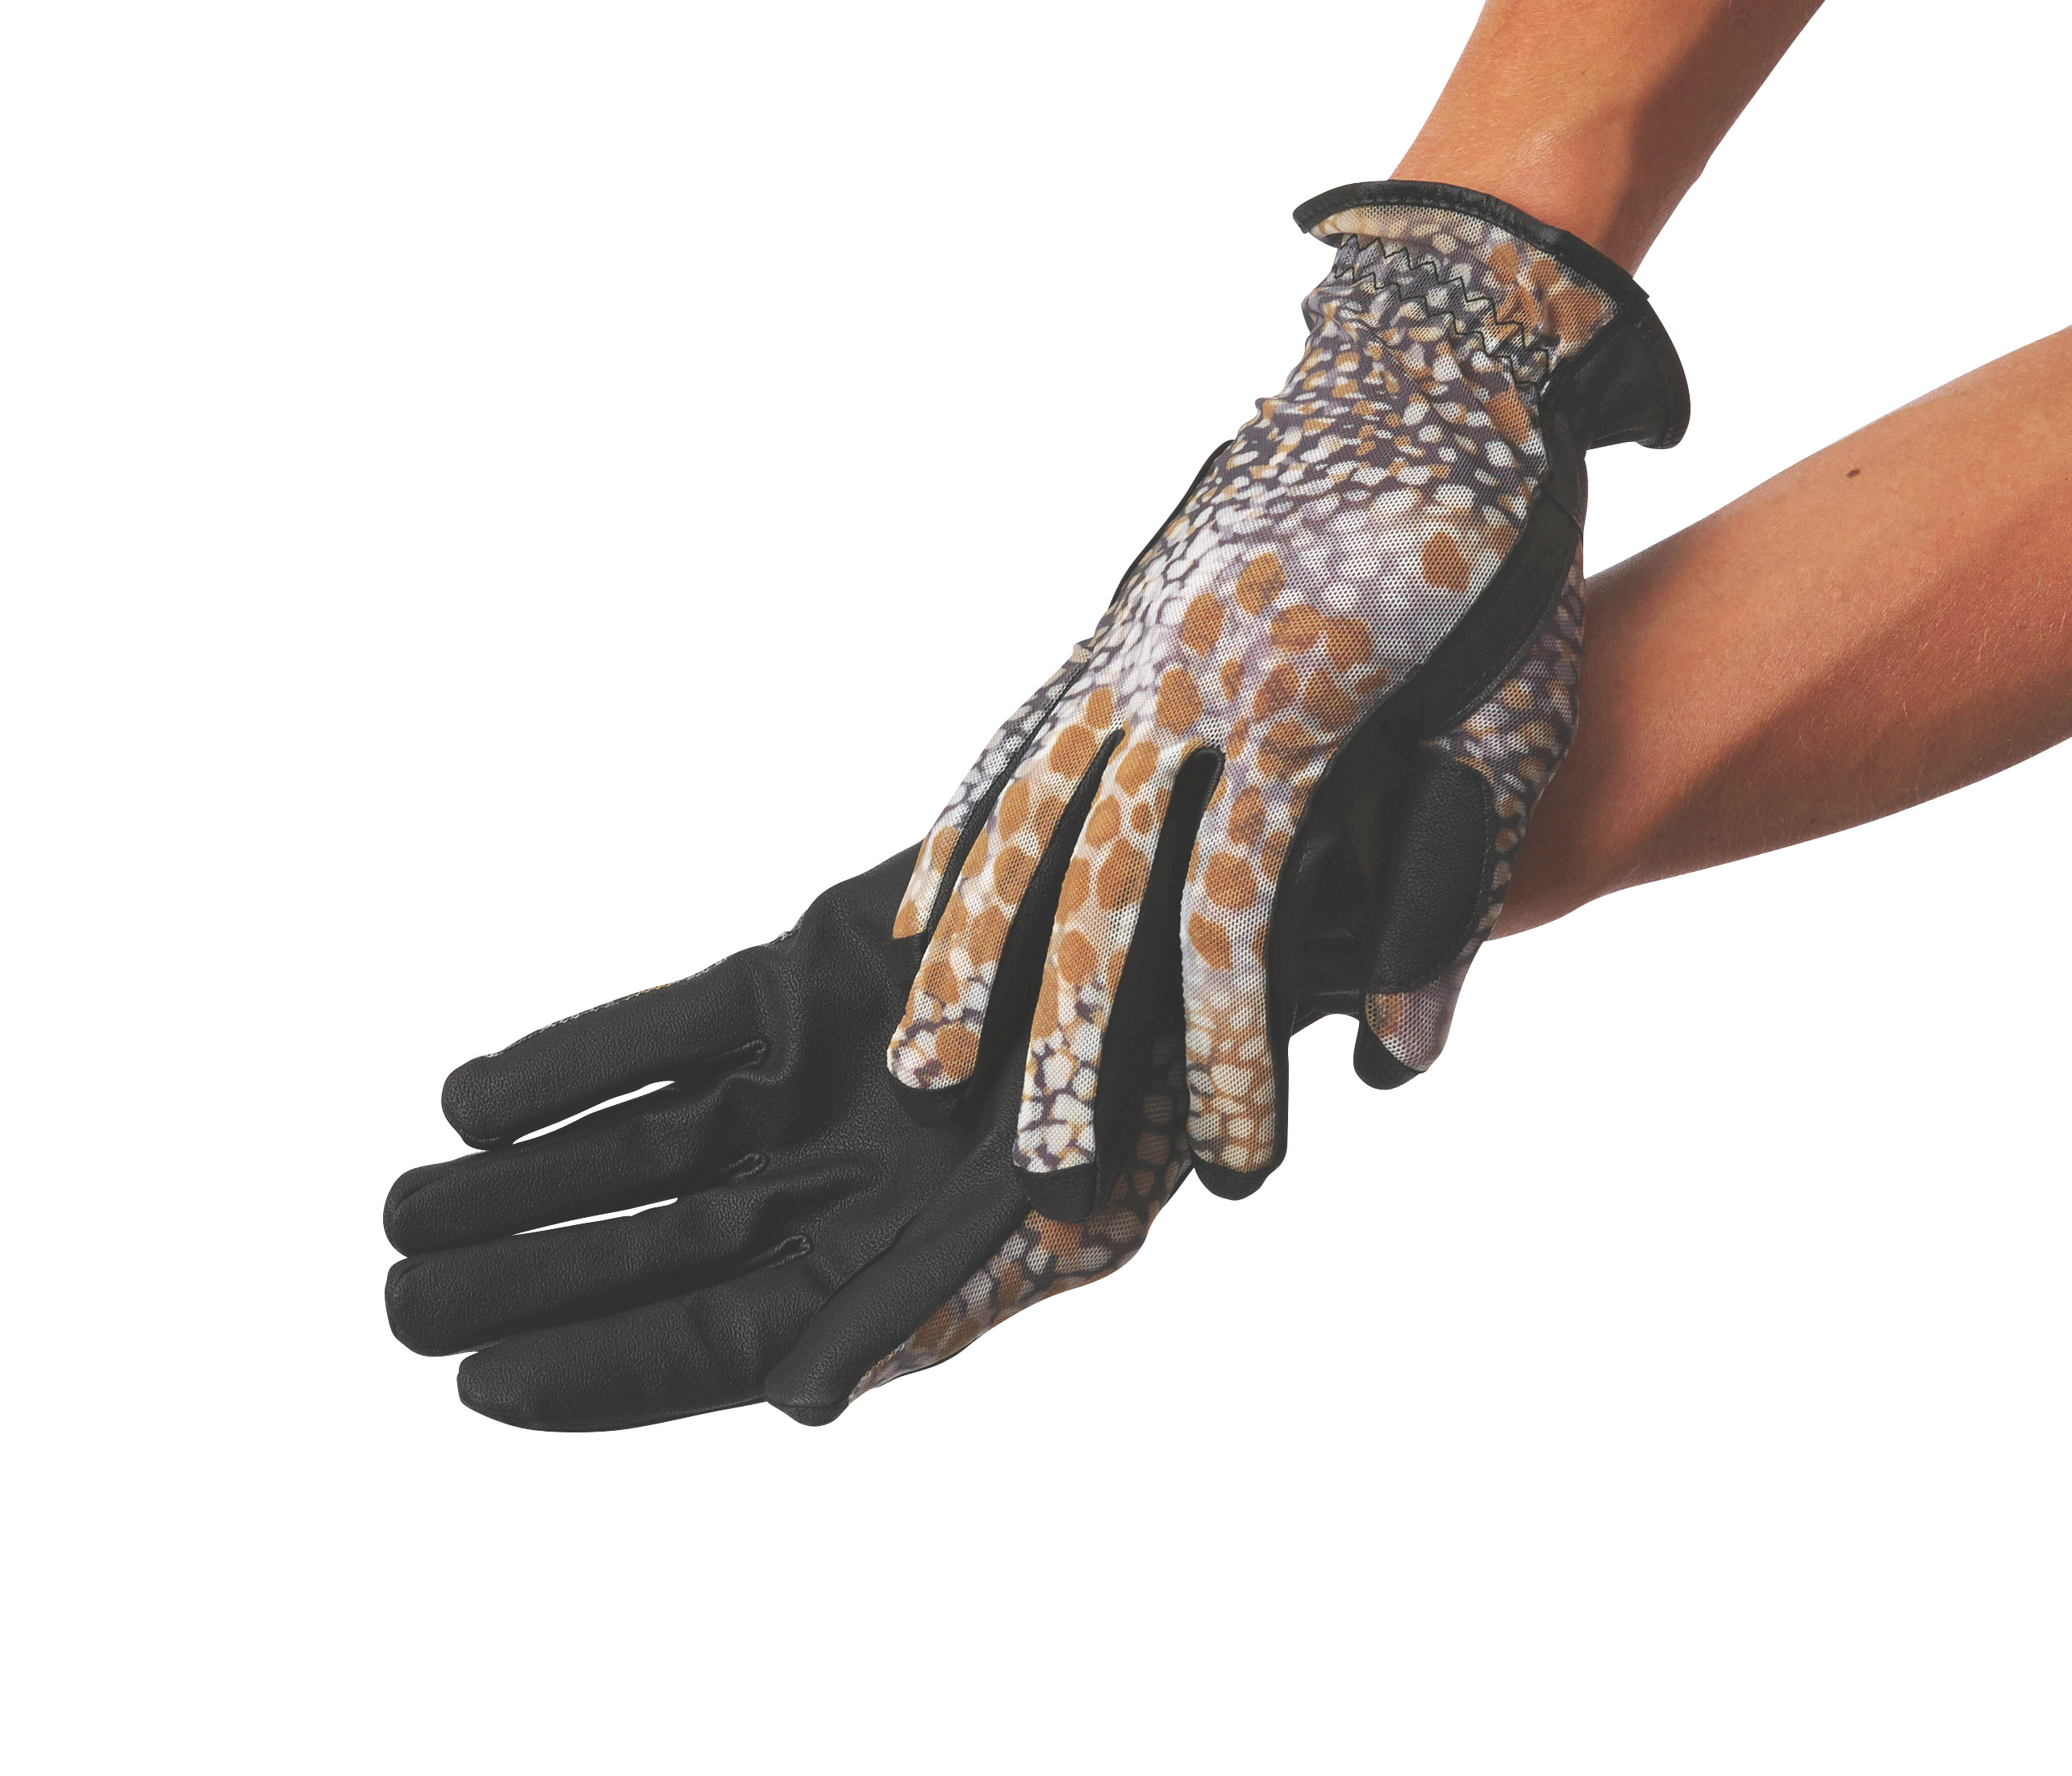 Kerrits Aerator Glove